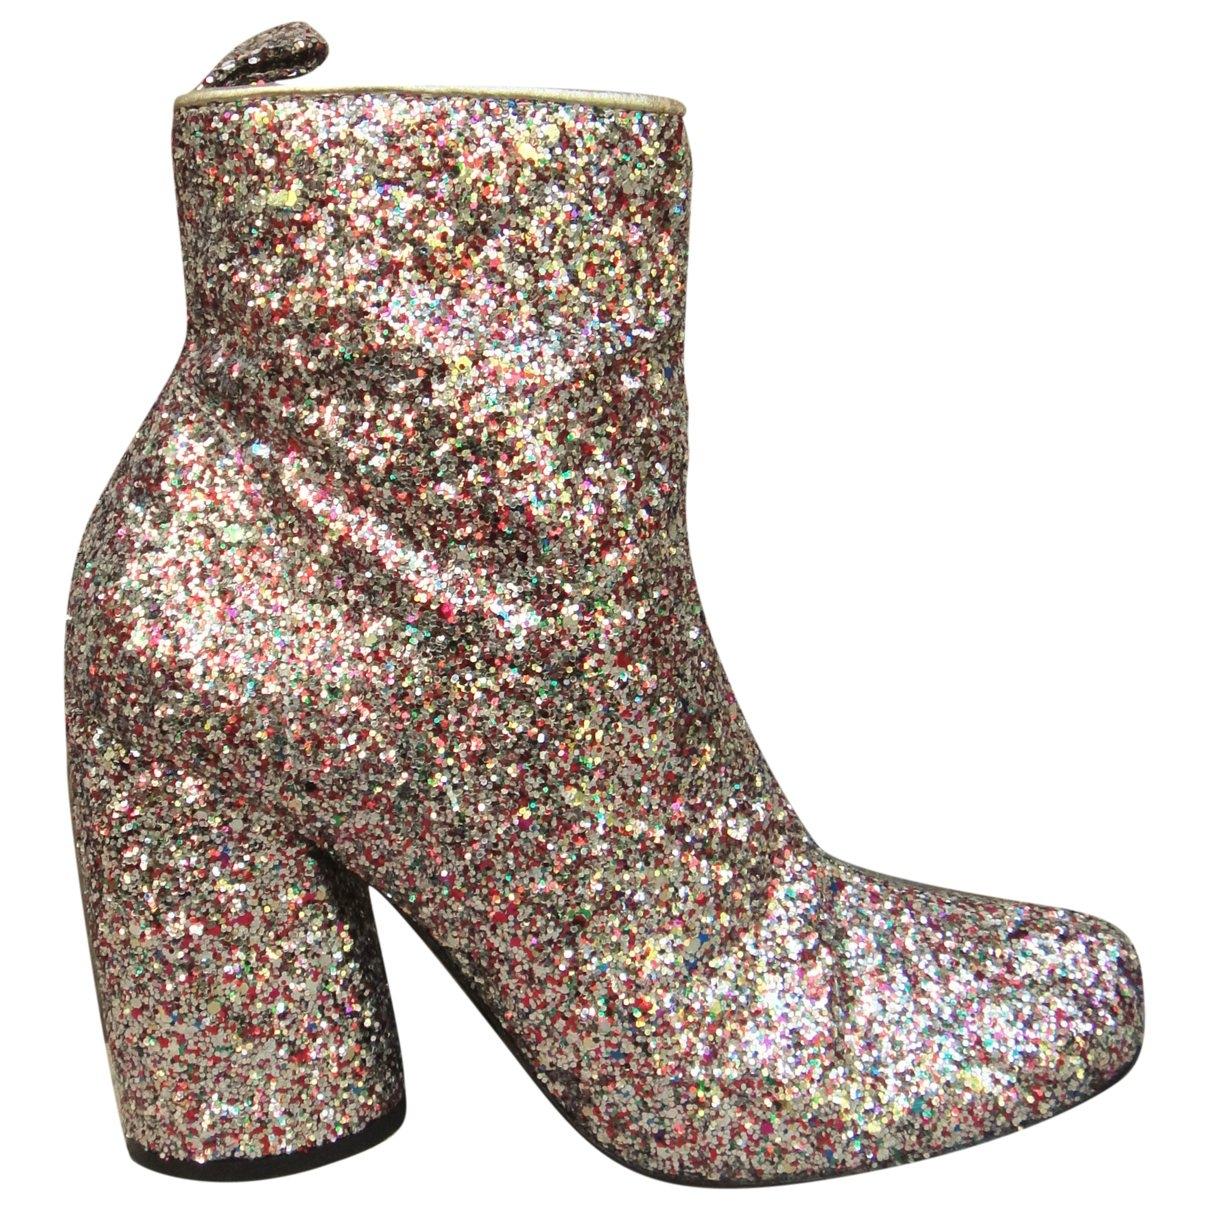 Tara Jarmon \N Multicolour Glitter Ankle boots for Women 36 EU